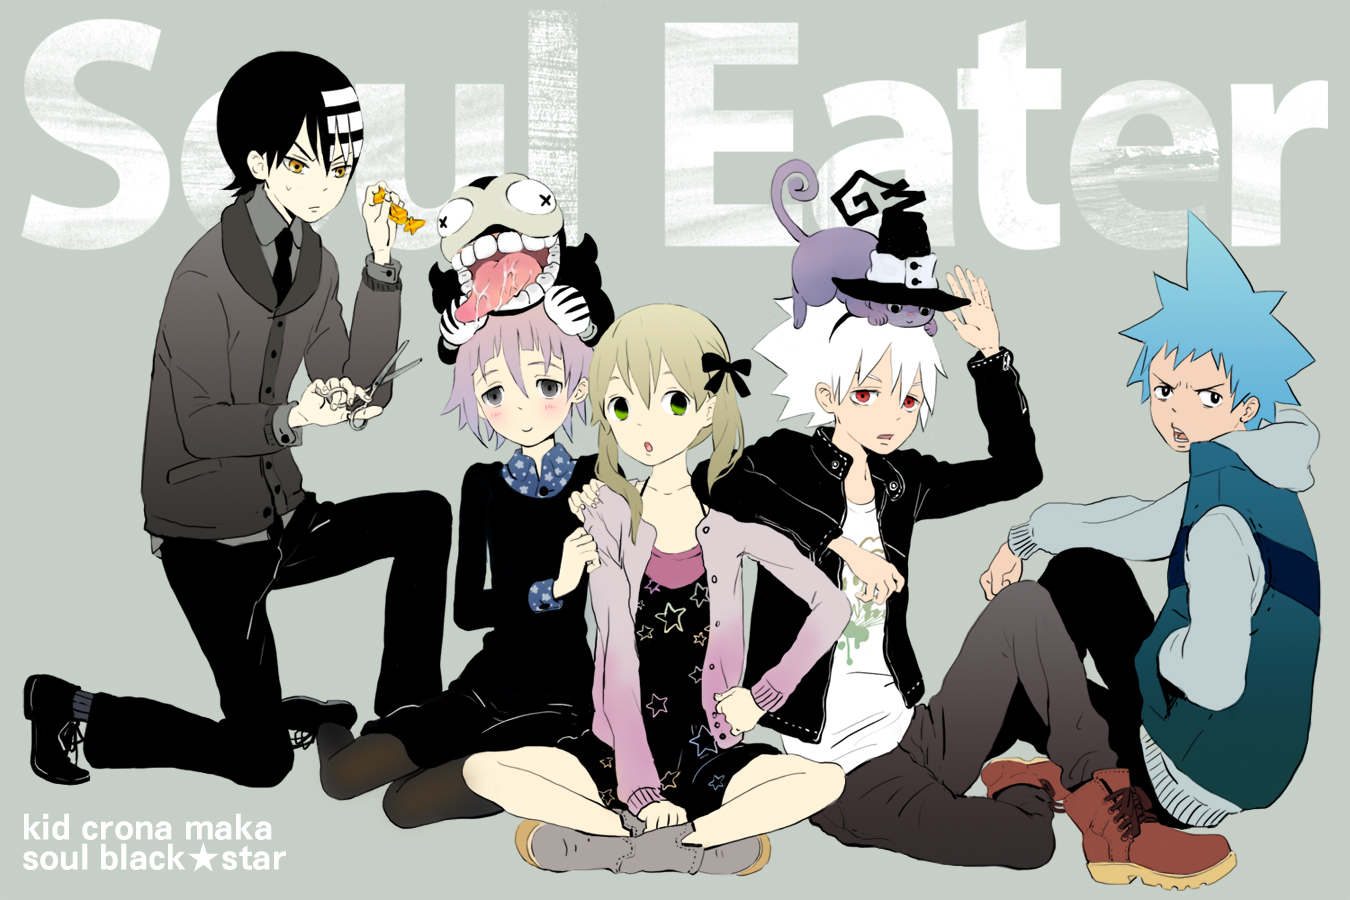 Soul Eater Ohkubo Atsushi Image 133179 Zerochan Anime Image Board